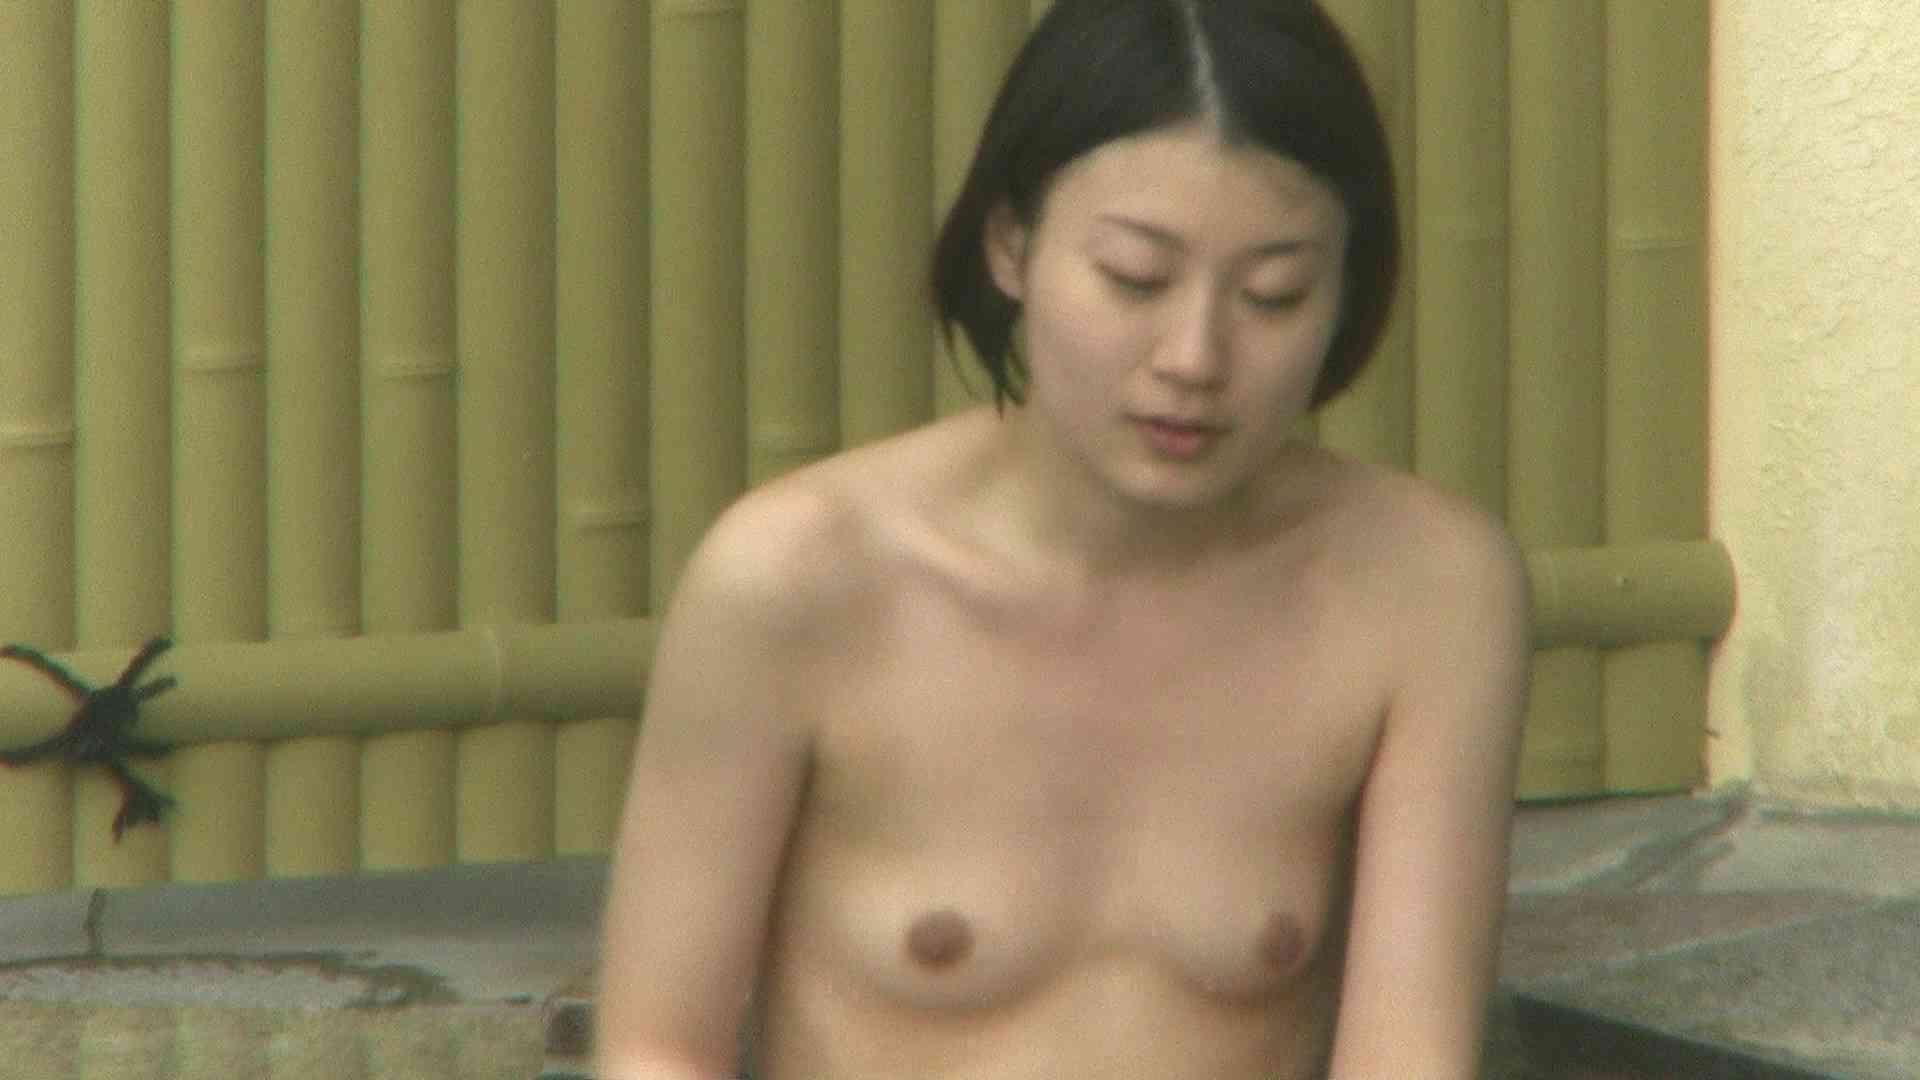 Aquaな露天風呂Vol.123 盗撮師作品 エロ画像 105pic 41